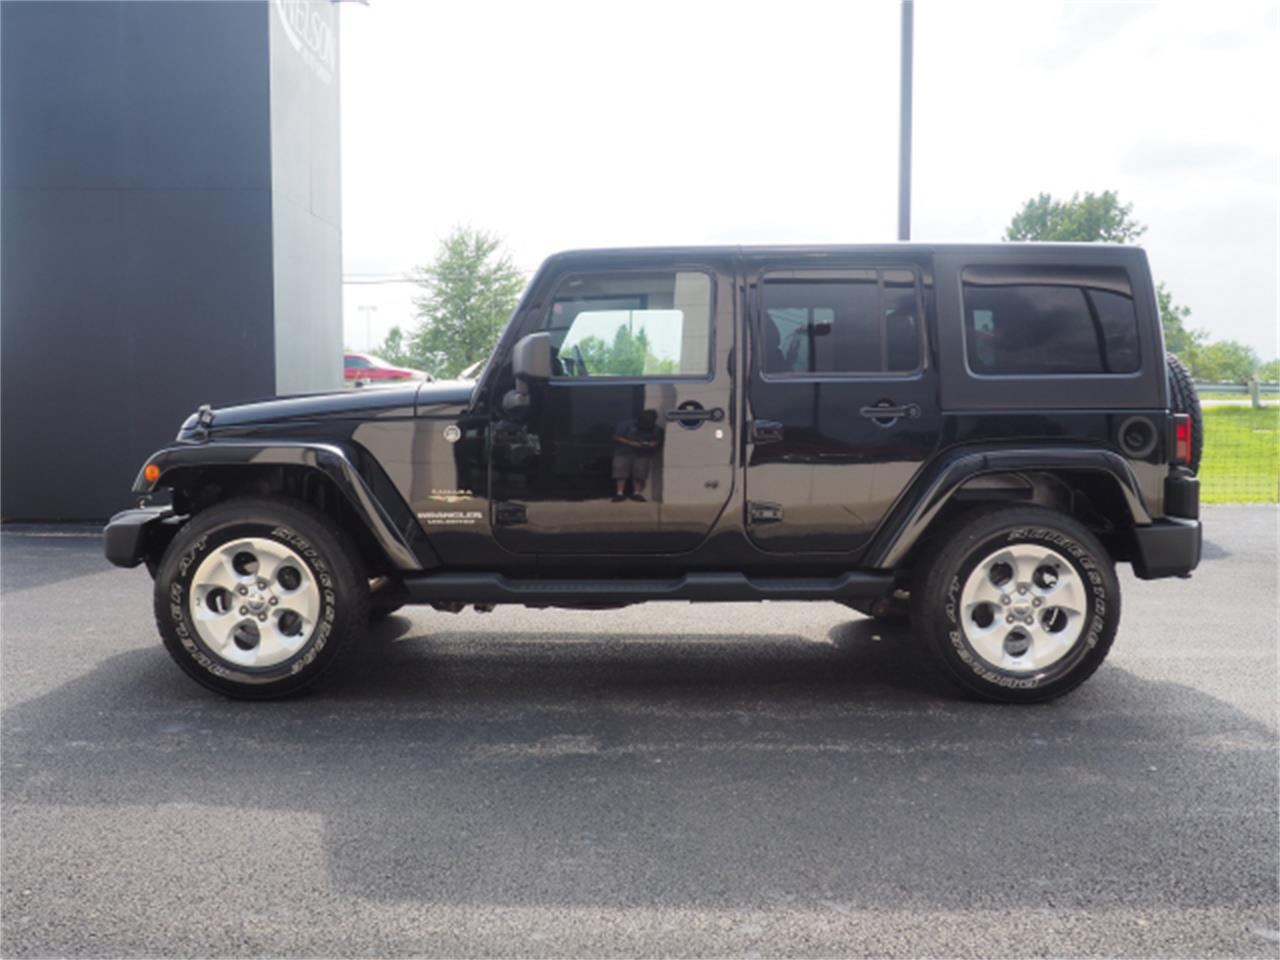 2013 Jeep Wrangler (CC-1199551) for sale in Marysville, Ohio